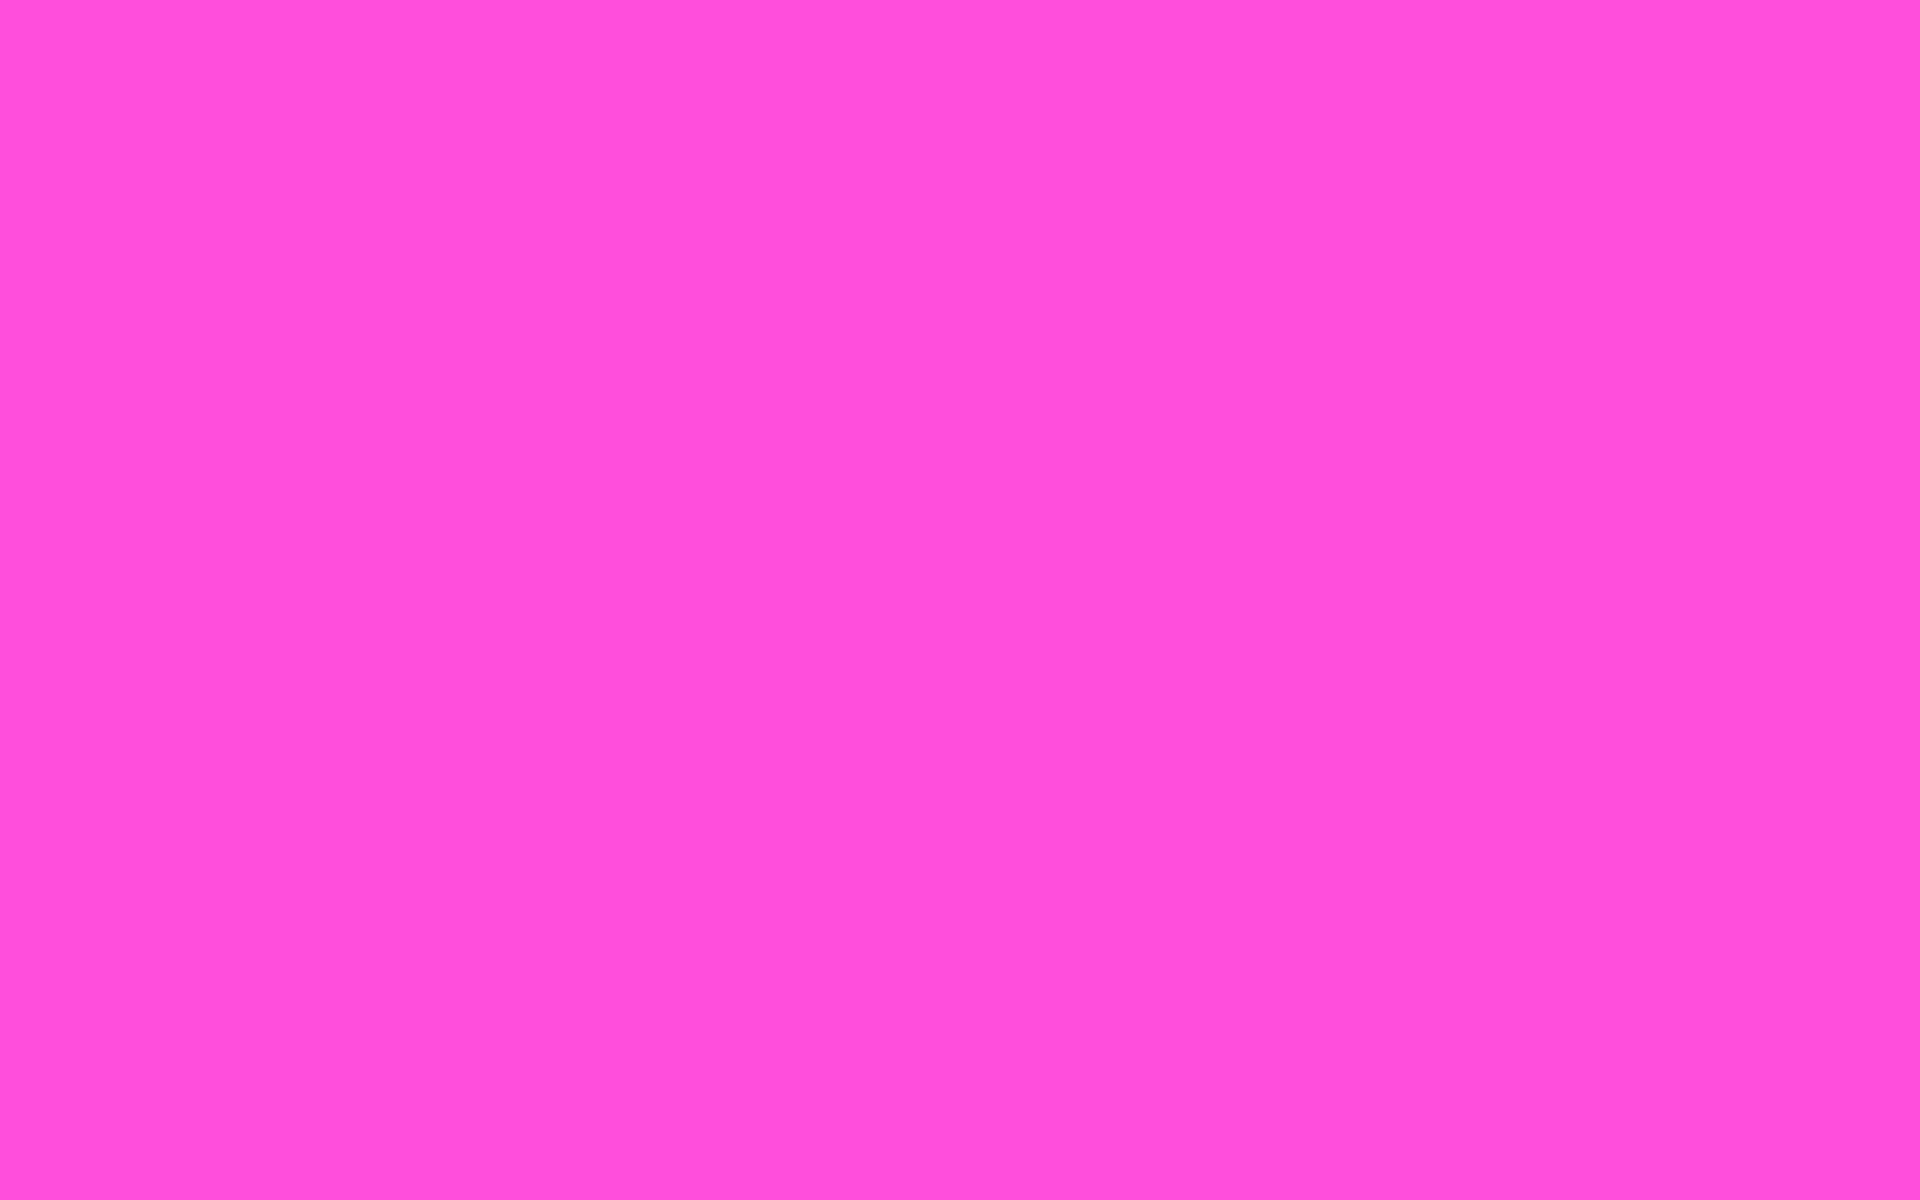 1920x1200 Purple Pizzazz Solid Color Background